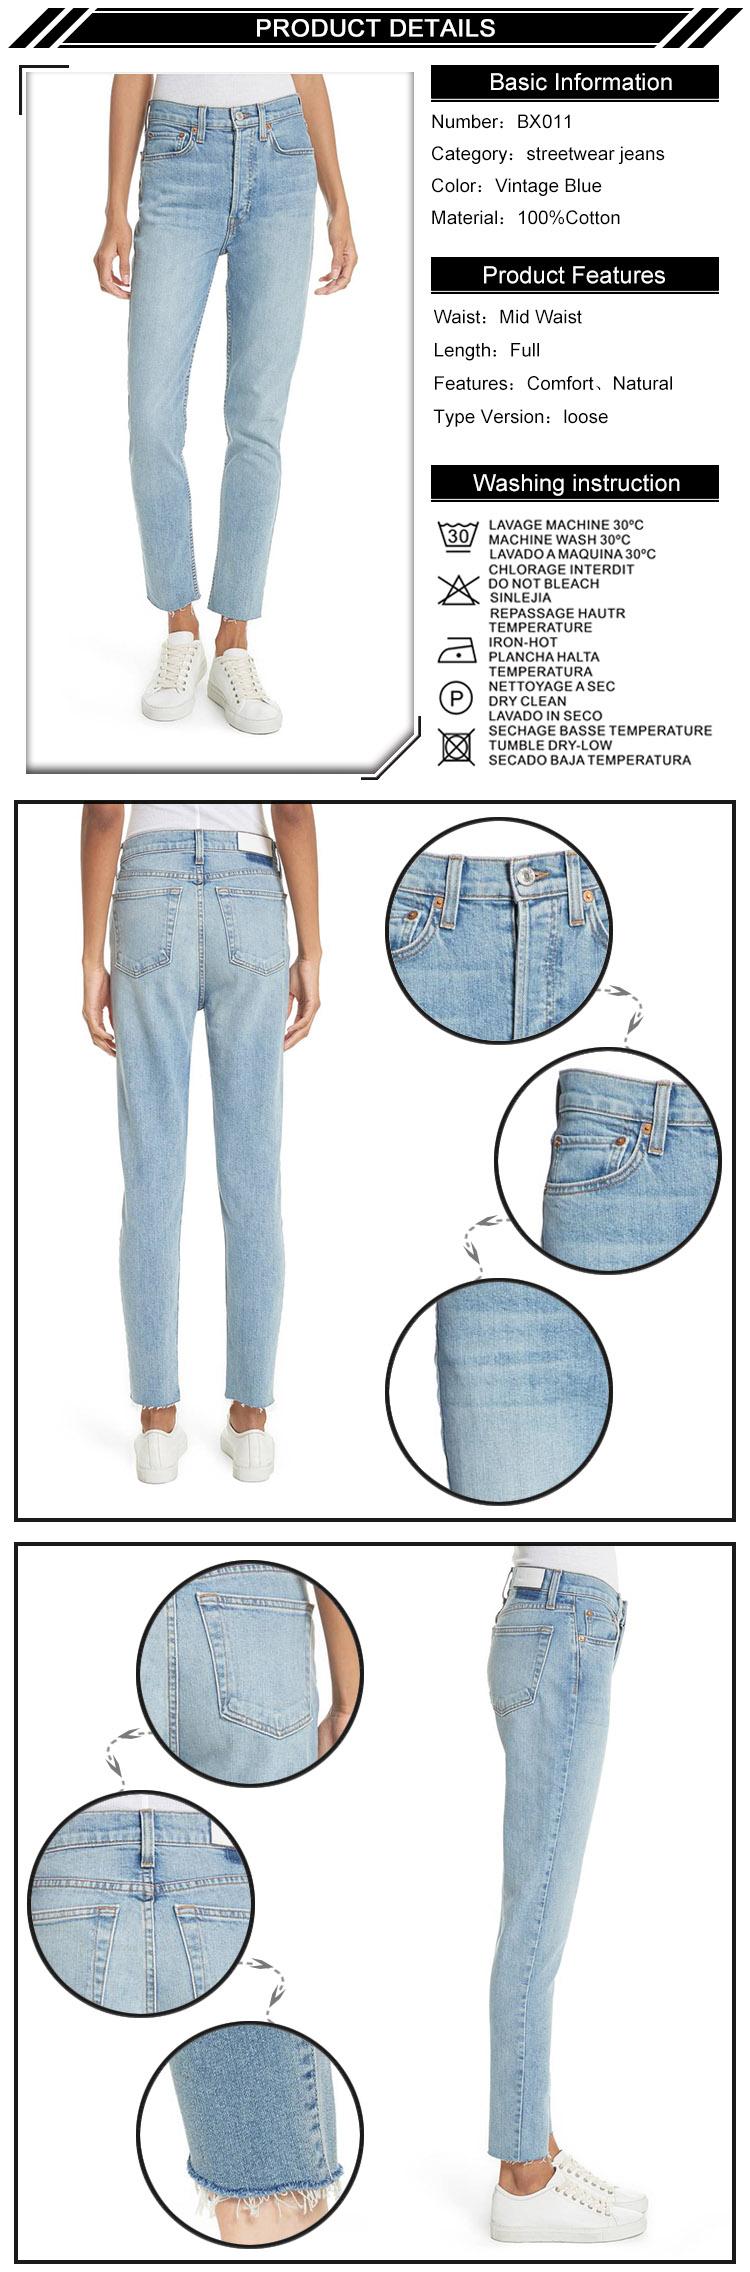 Hot-selling Fashionable Slim Fit Basic Design Women Jeans